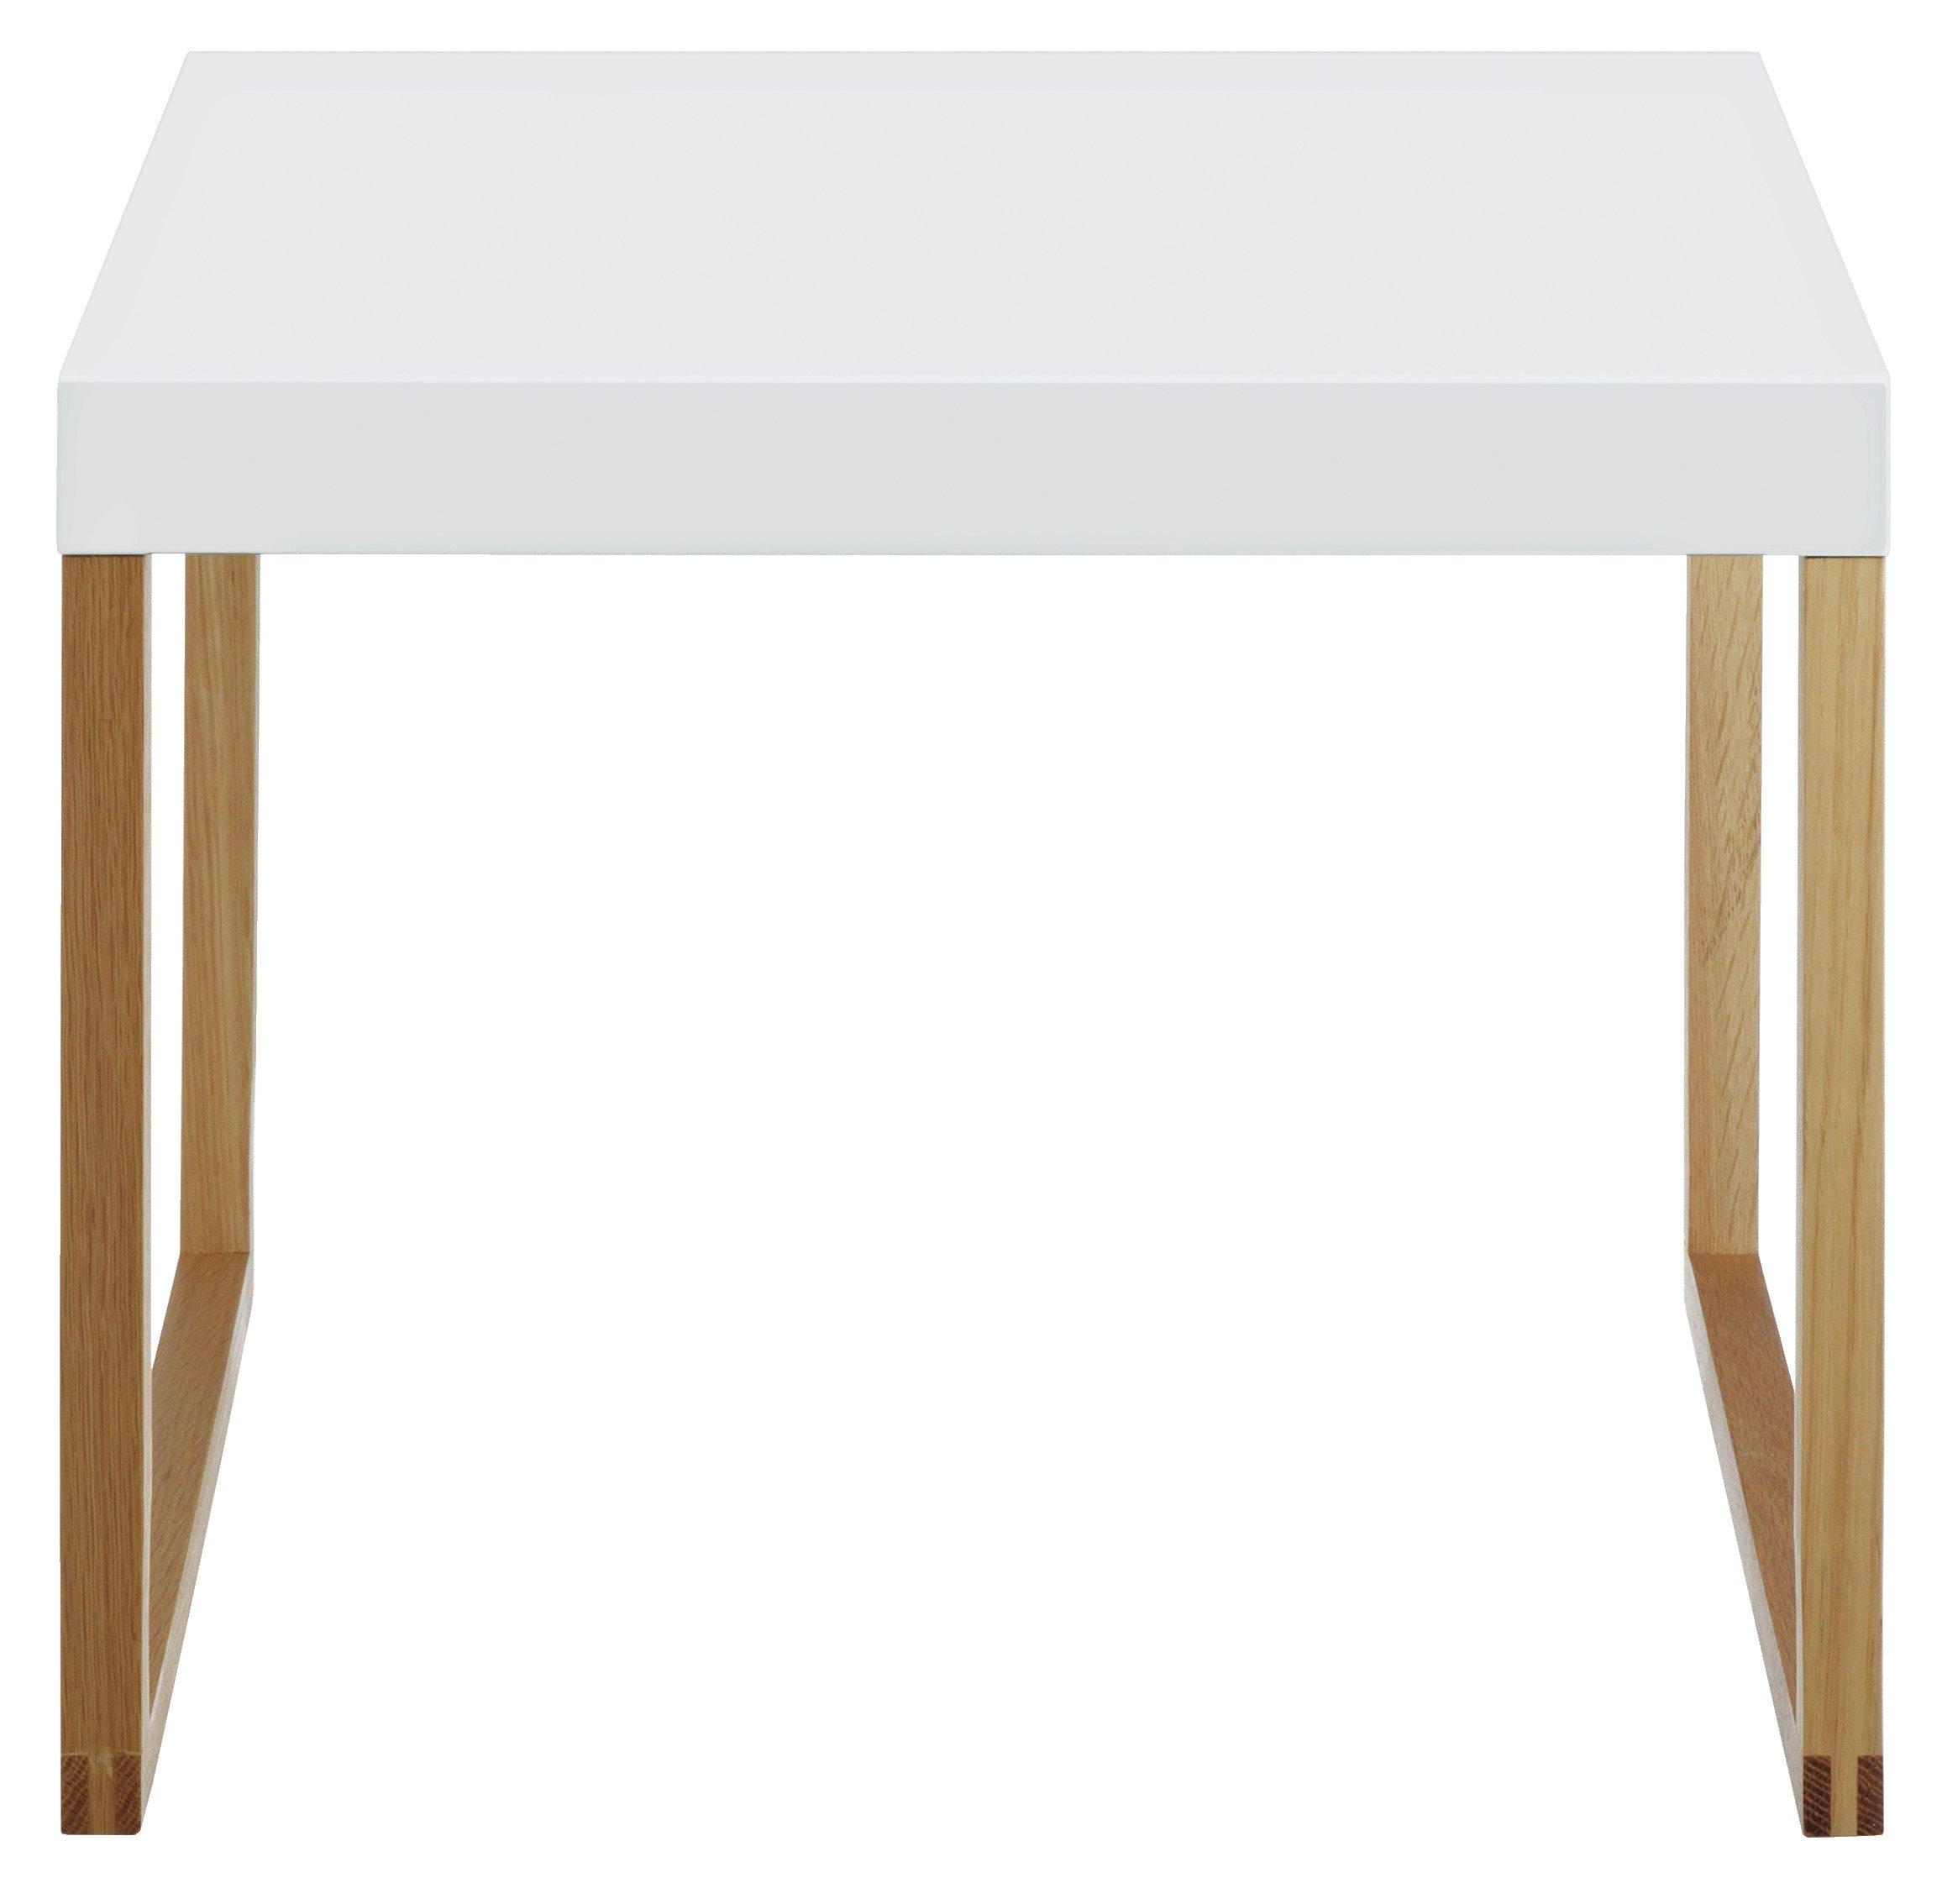 buy habitat kilo side table at argos.co.uk - your online shop for